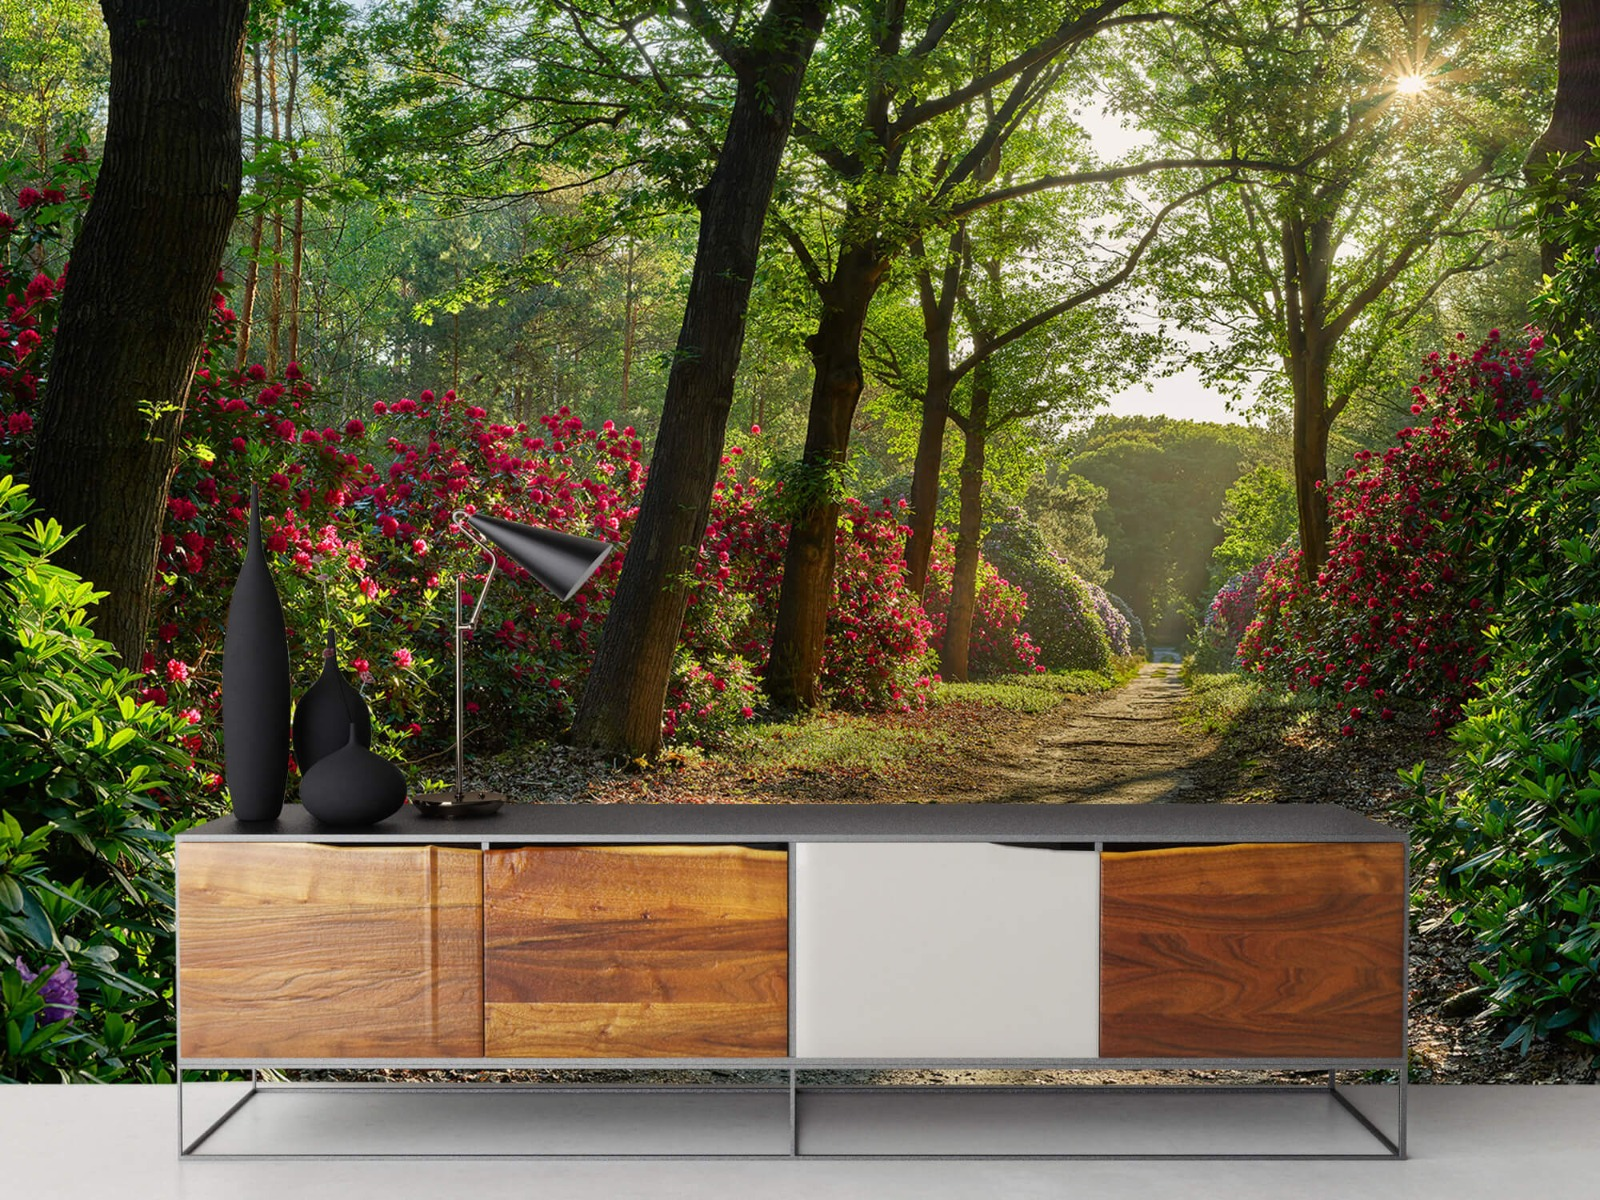 Bos - Zonsopkomst bij pad met rhododendrons 16